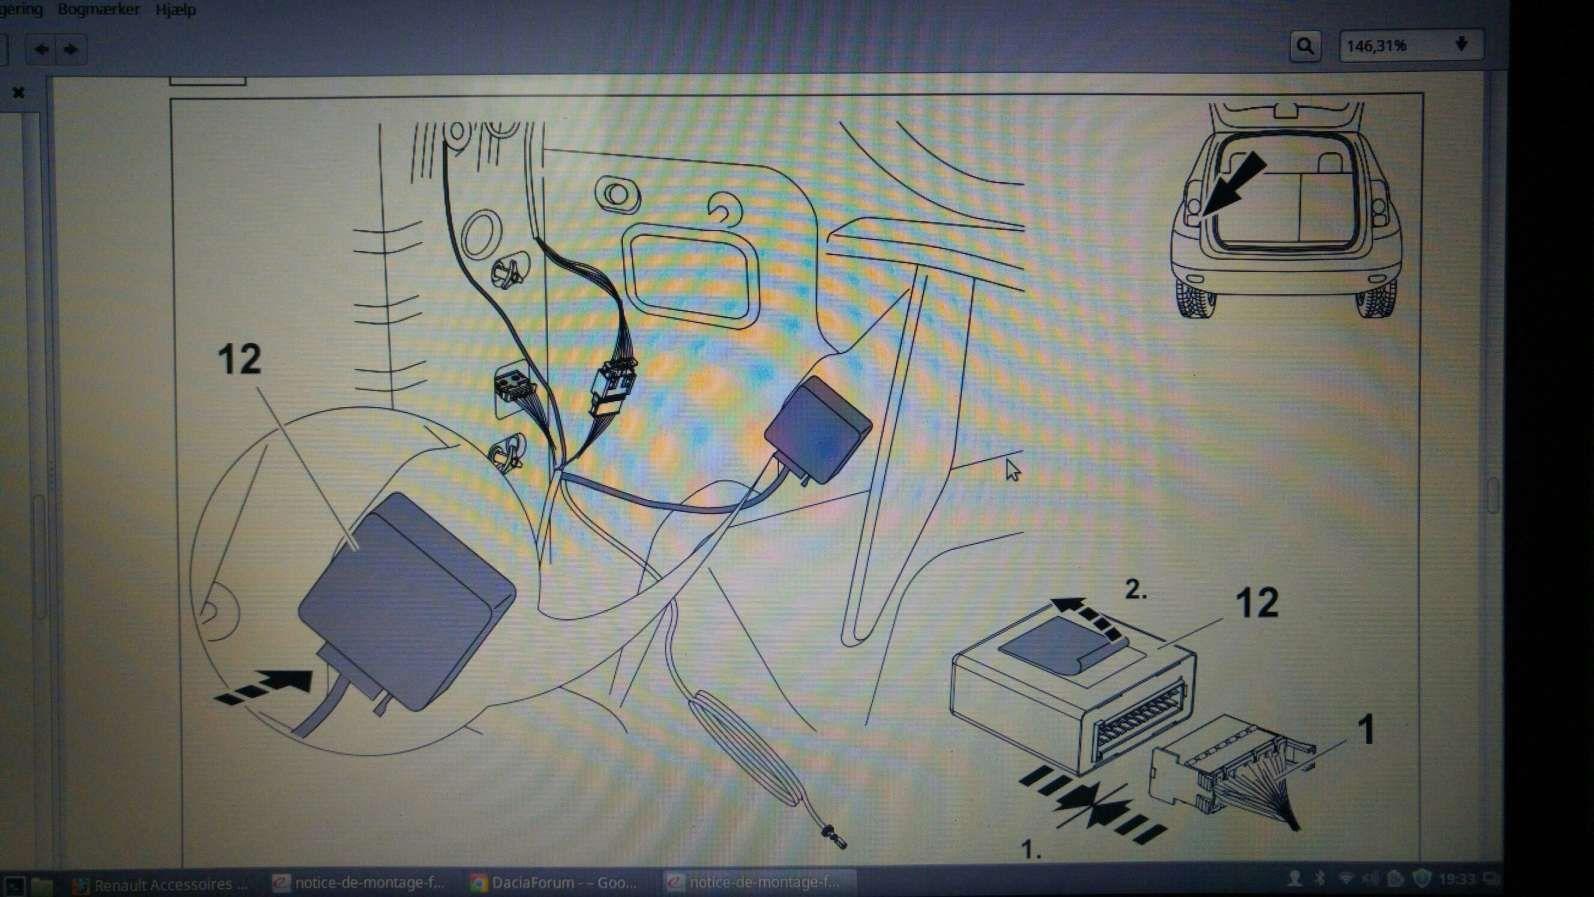 18 Dacia Duster Electrical Wiring Diagram Wiring Diagram Wiringg Net In 2021 Electrical Wiring Electrical Wiring Diagram Diagram